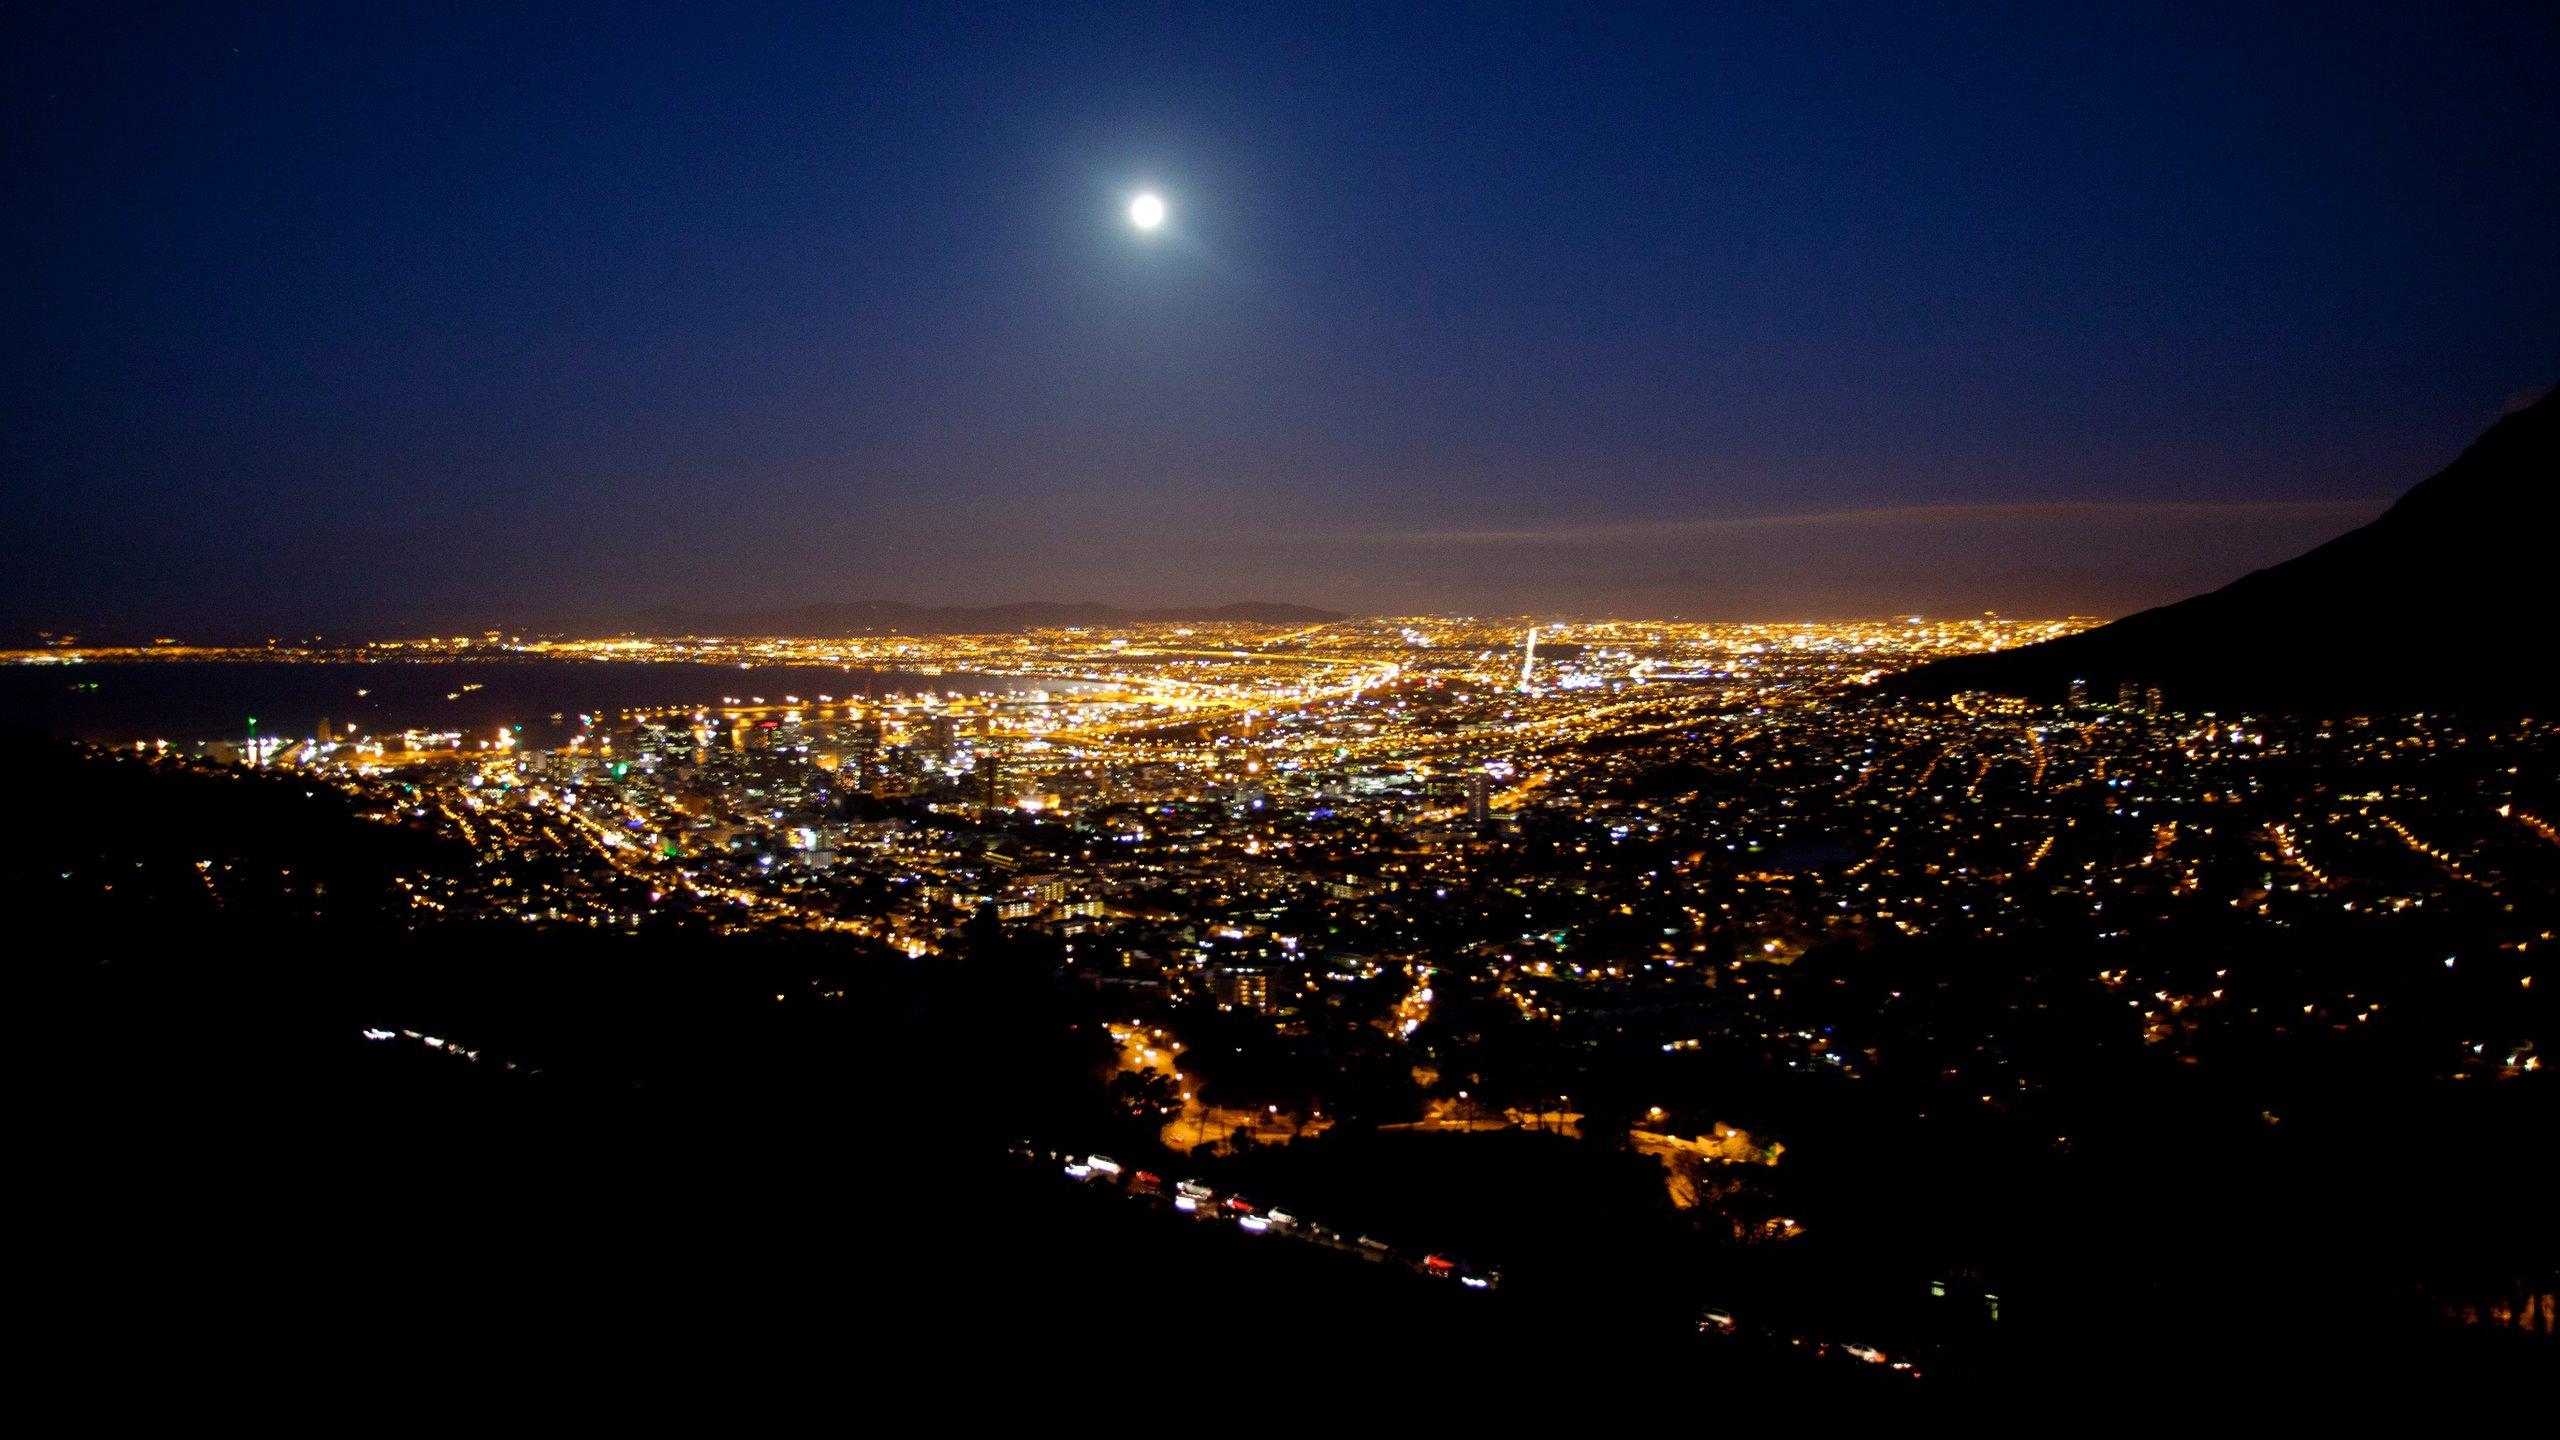 Küstenvorland, Kapstadt, Westkap (Provinz), Südafrika